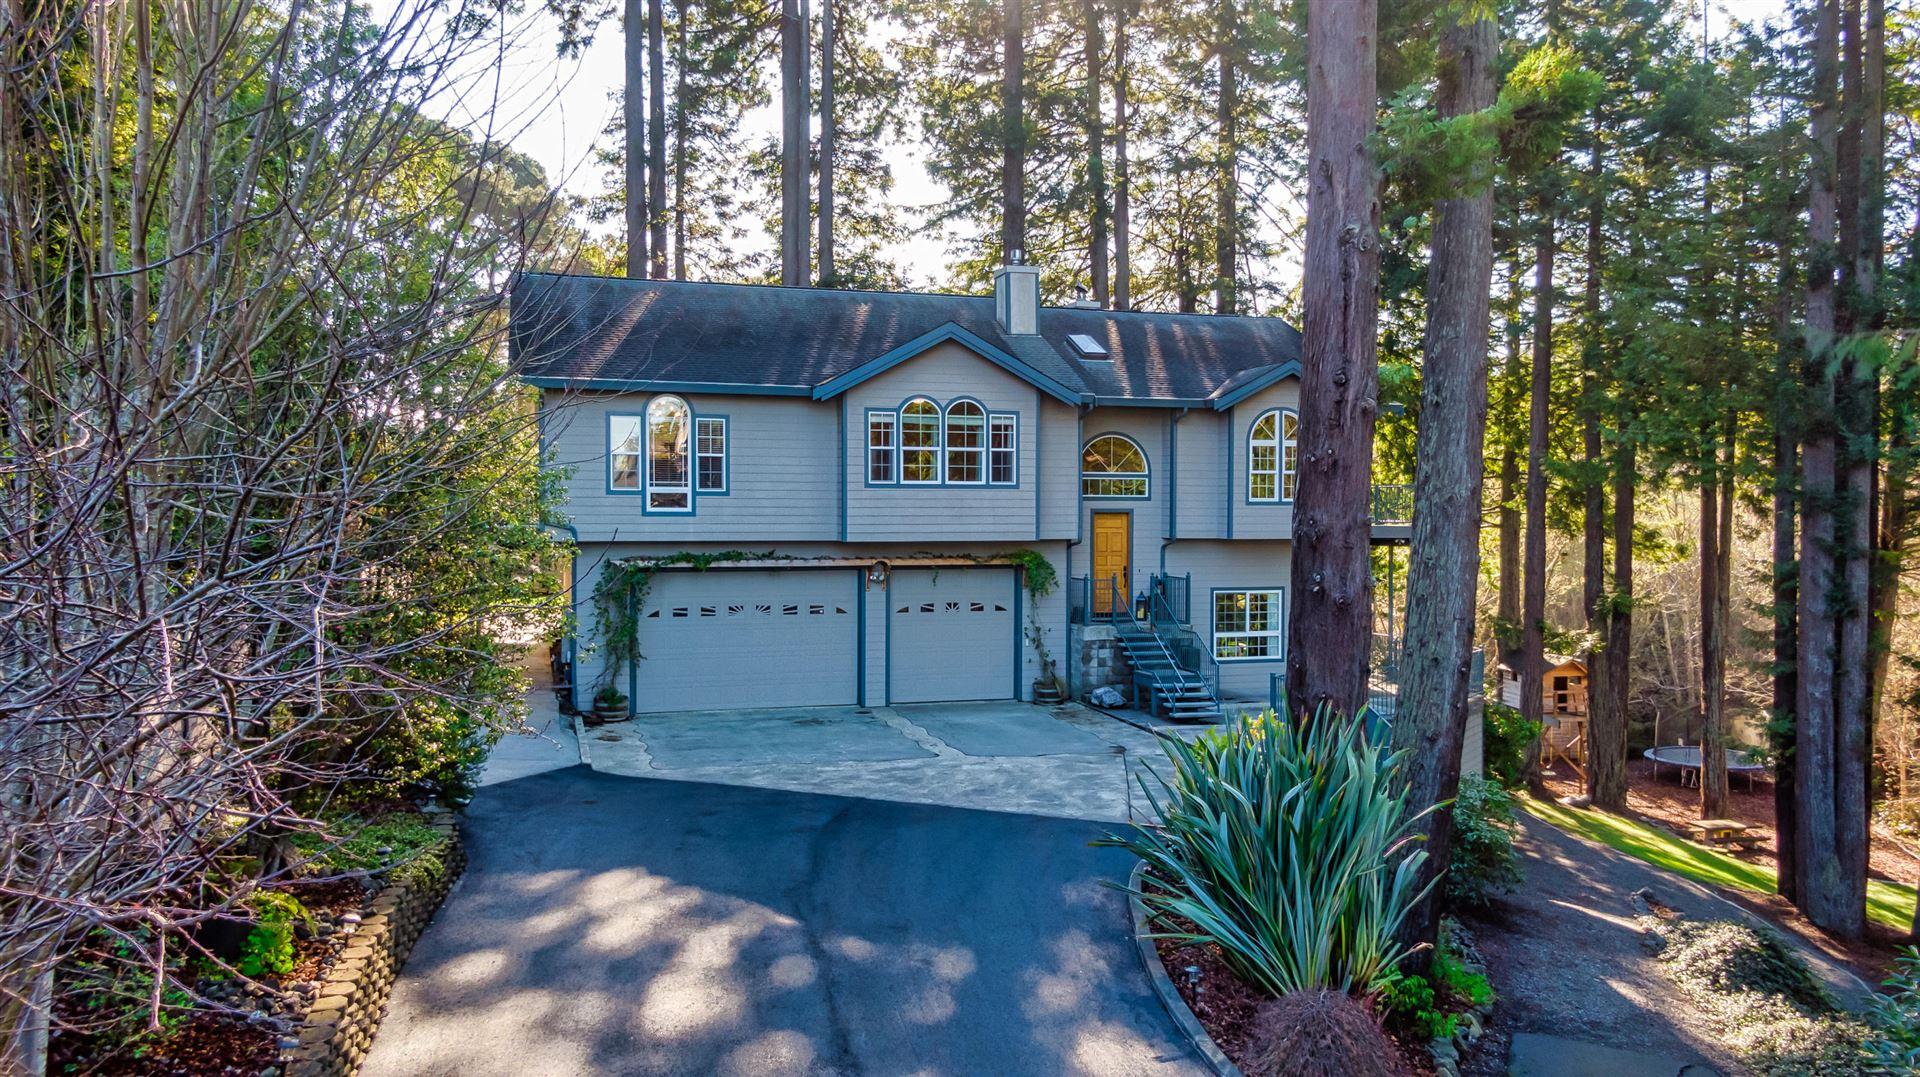 2300 Hillside Drive, Eureka, CA 95501 - MLS#: 258193